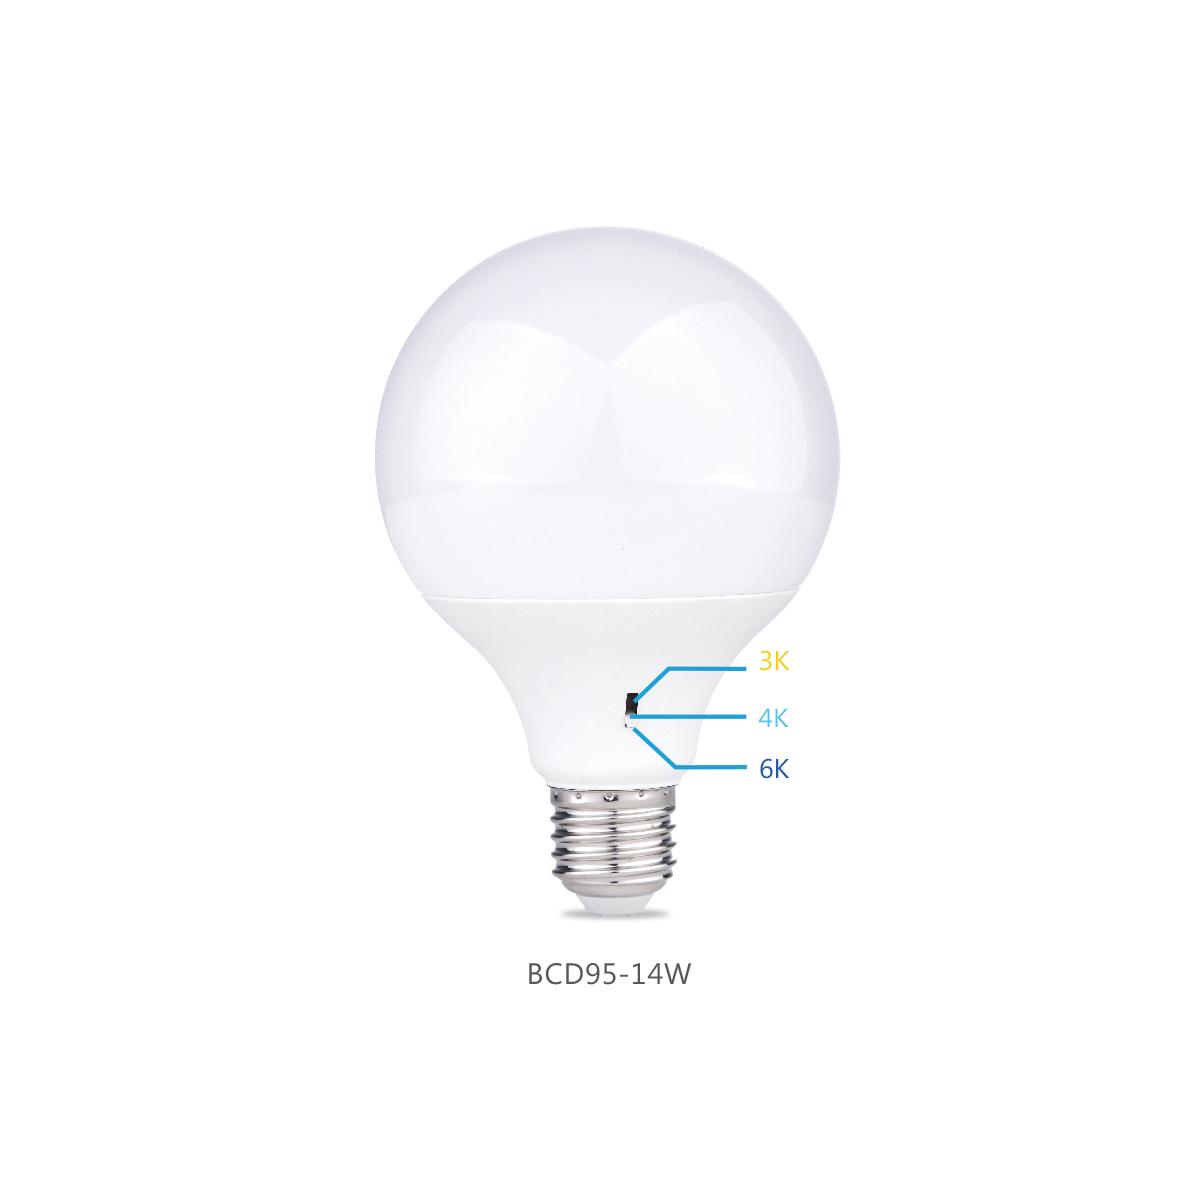 3CCT Patent Bulb BCD95-14W